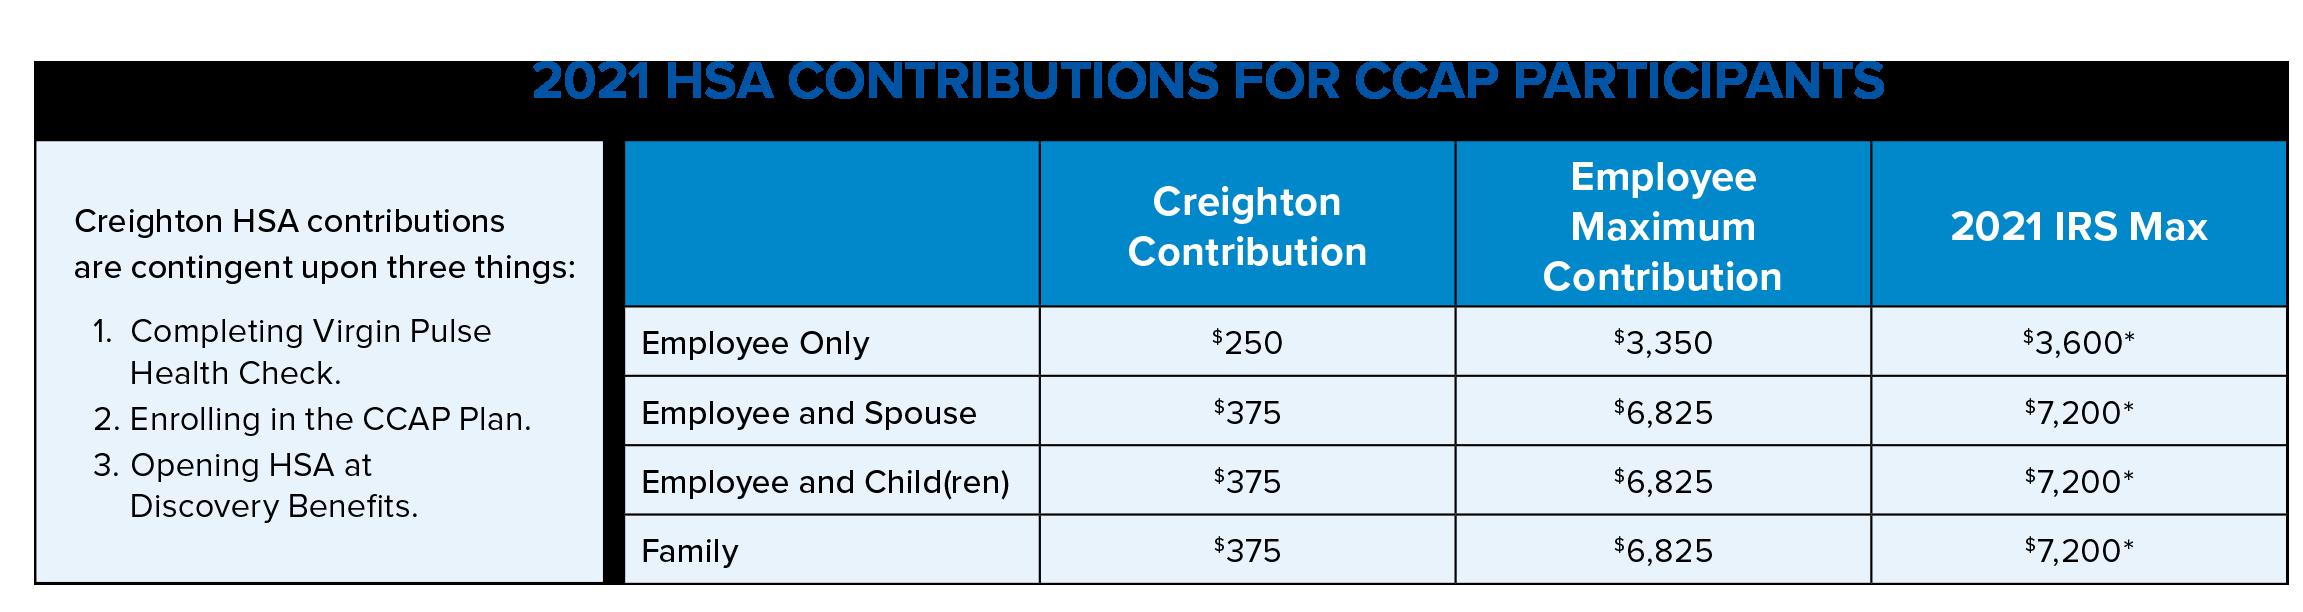 2021-HSA-Contributions-FINAL